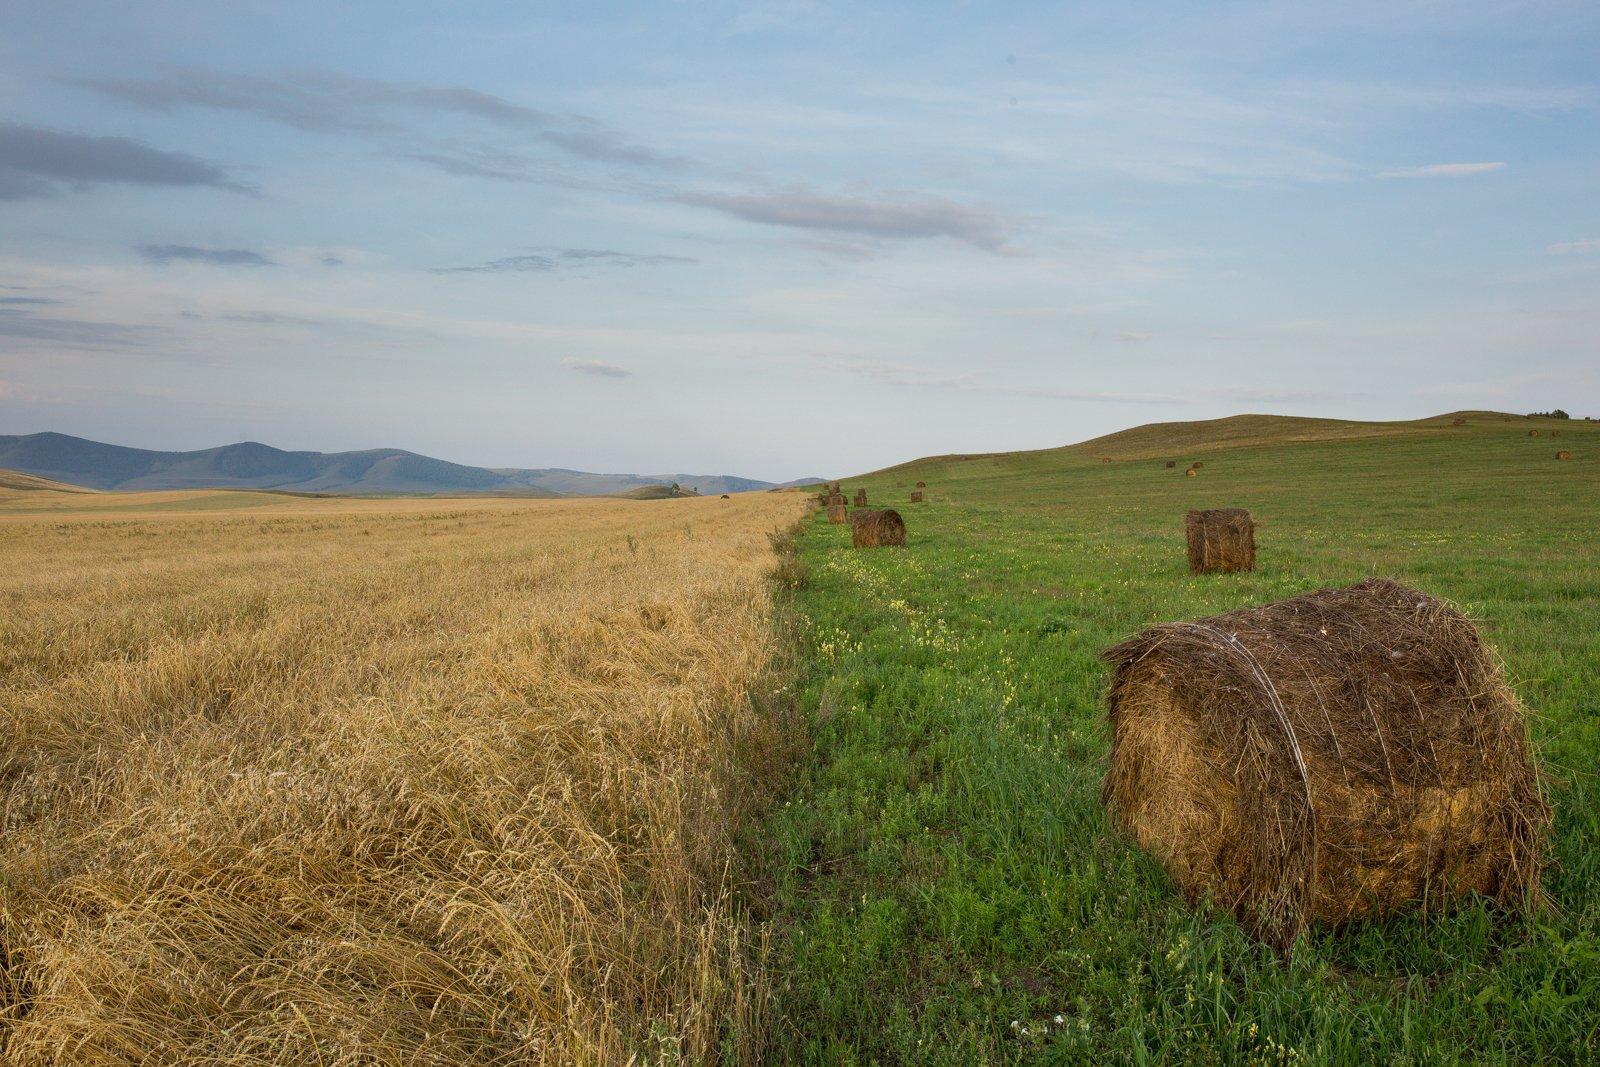 Зеленый, Лето, Пейзаж, Поле, Природа, Сено, Уборка, Хакасия, Александр Нерозя